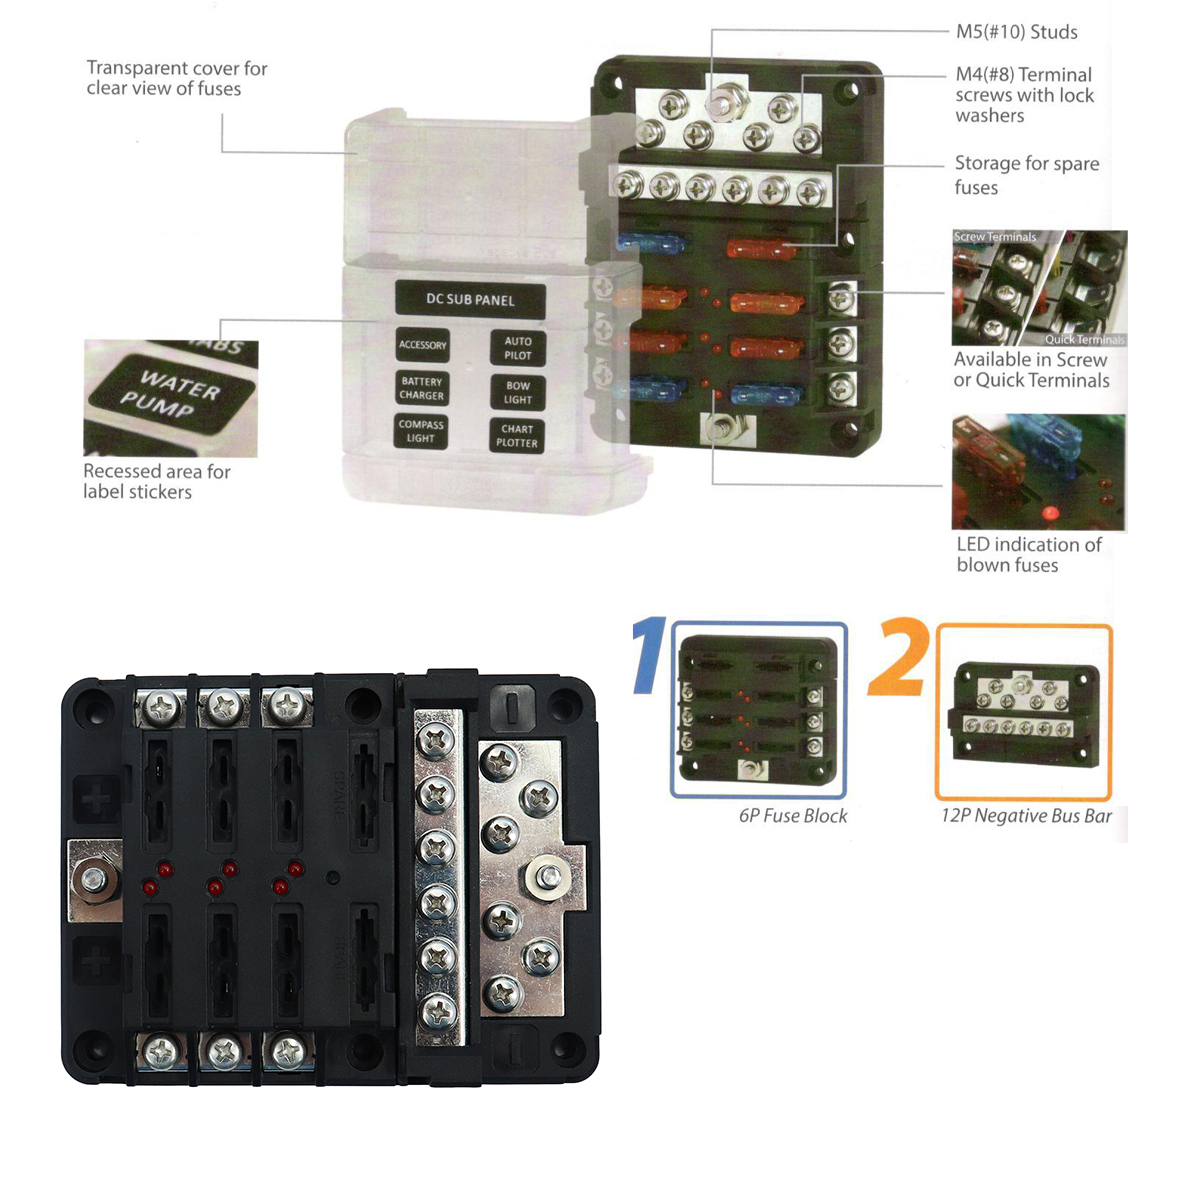 small resolution of f3618 dc fuse box with lamp 12 bit negative common box modular fl70 fuse holder diagram